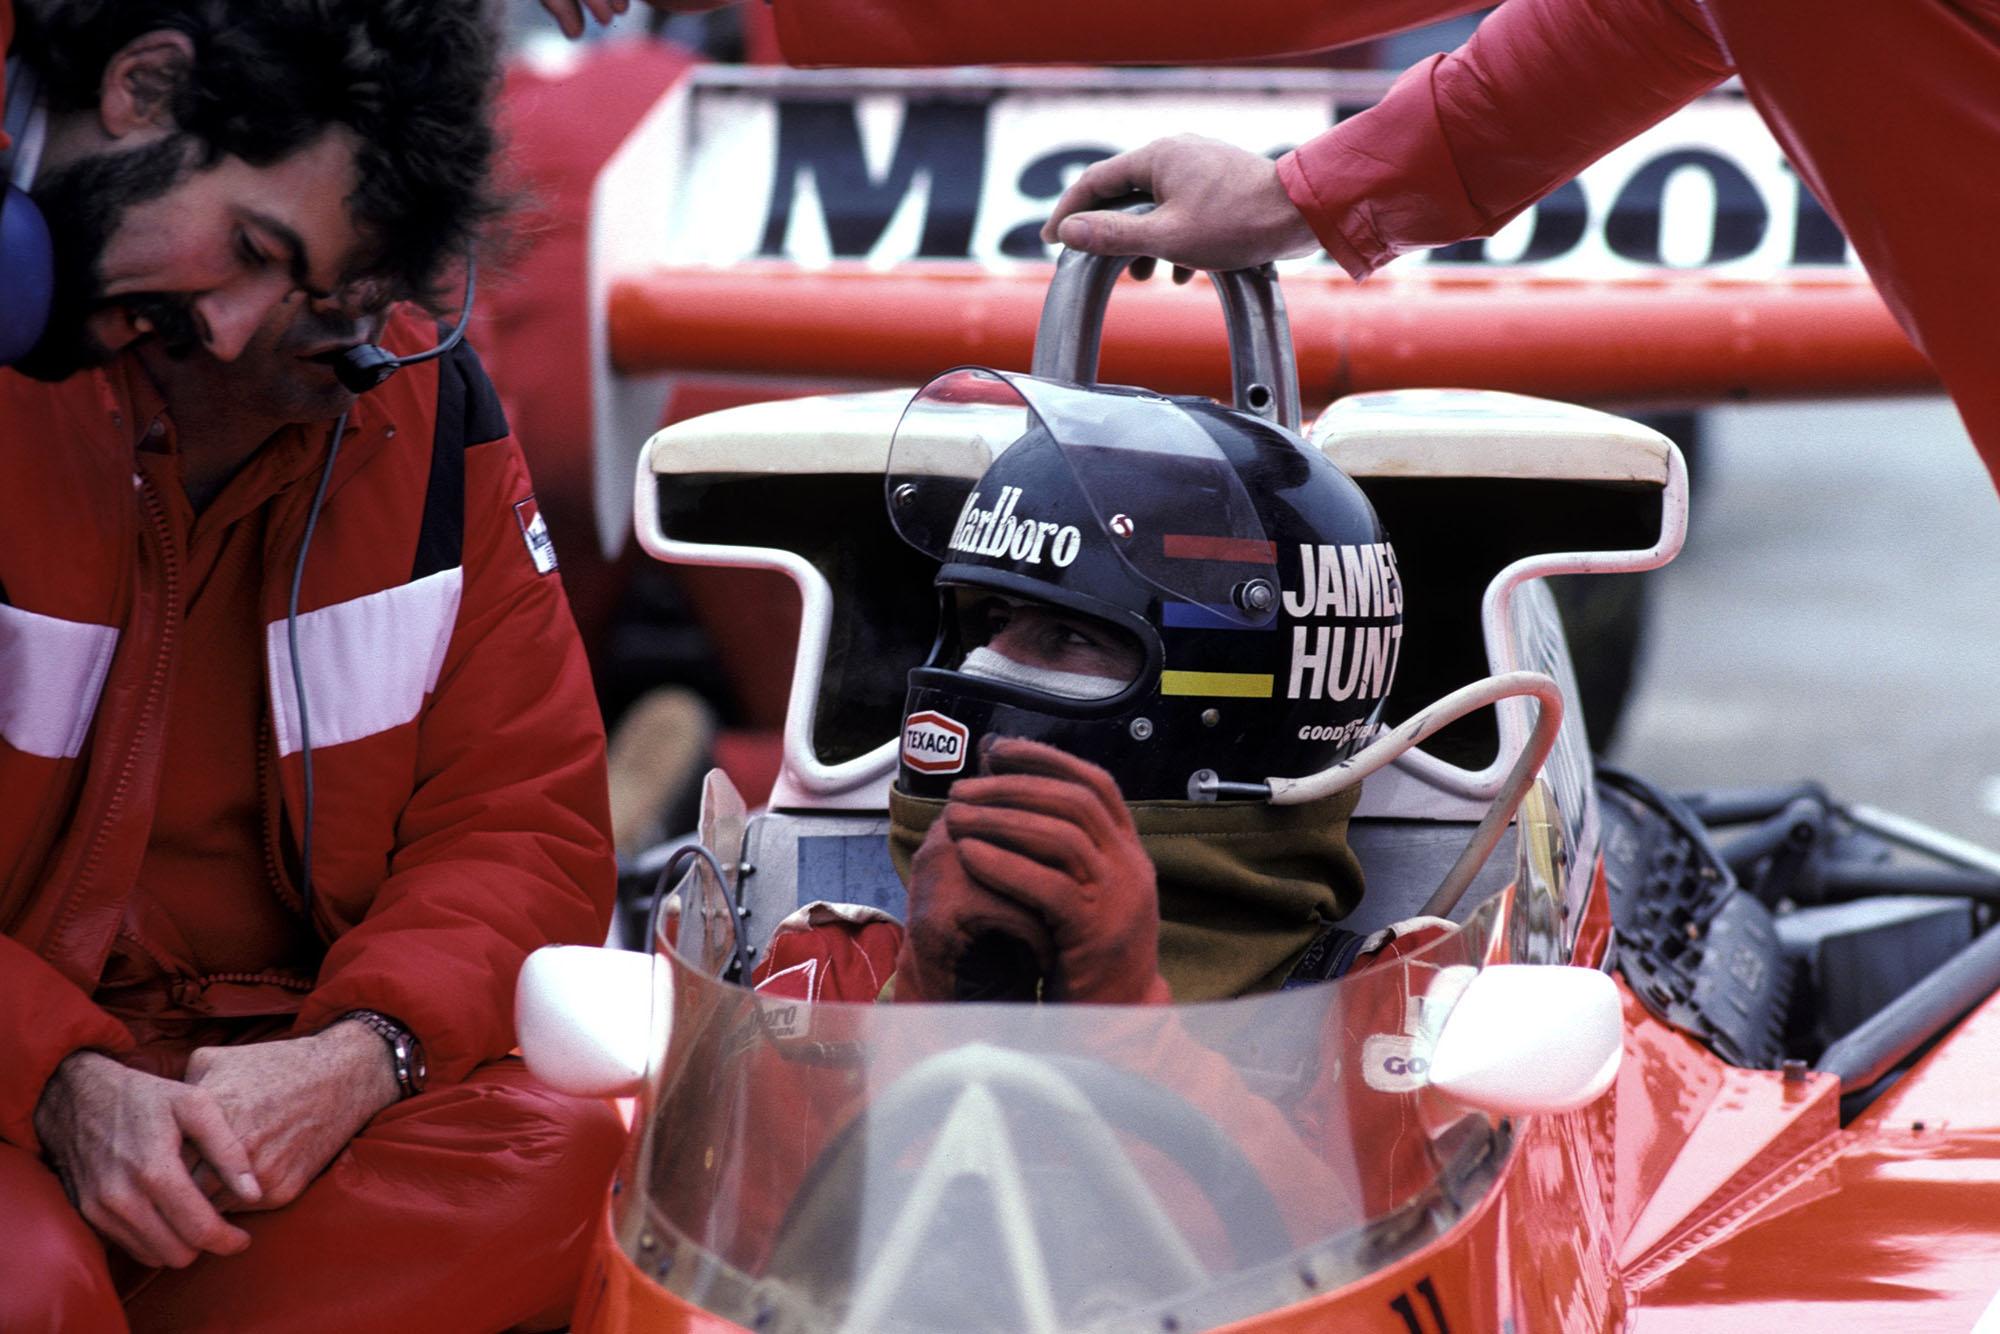 James Hunt (McLaren) sits in his car at the 1976 United States Grand Prix East, Watkins Glen.